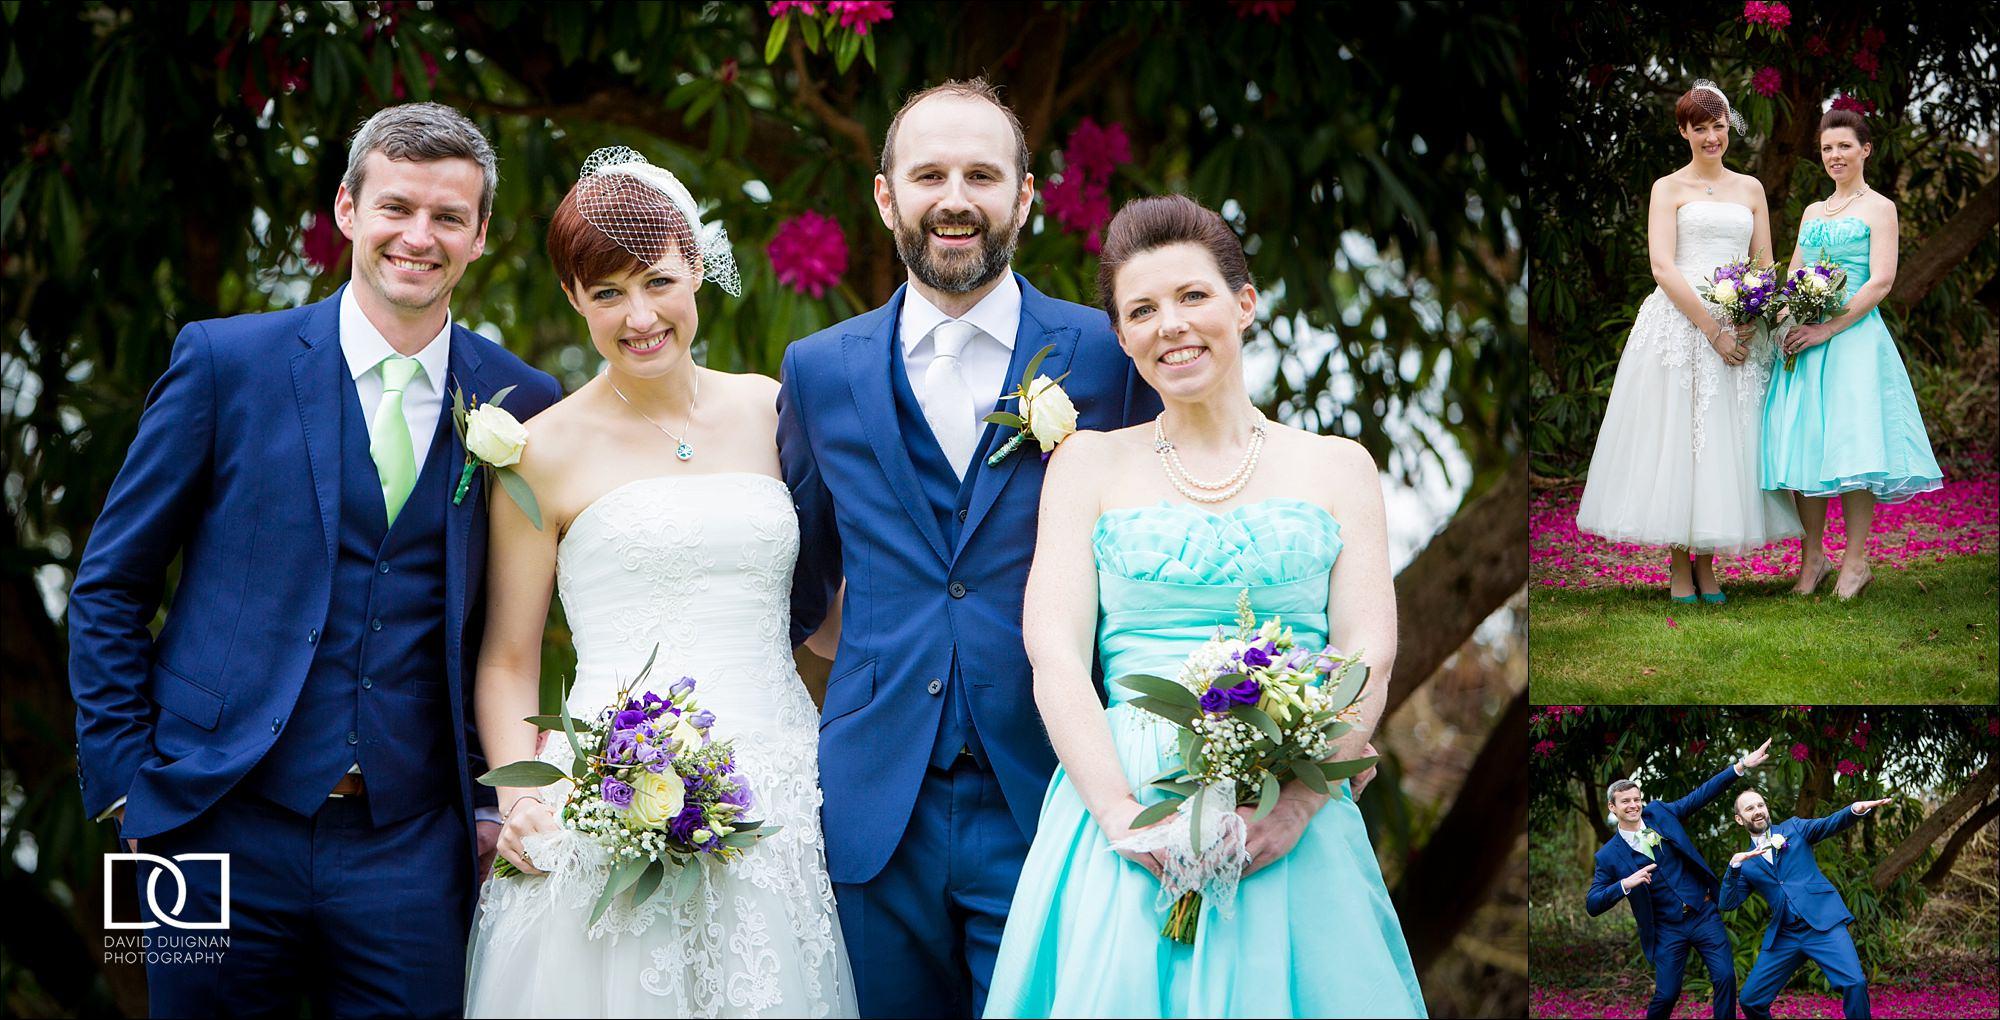 dublin wedding photographer david duignan photography horetown house wedding wexford Ireland 0033